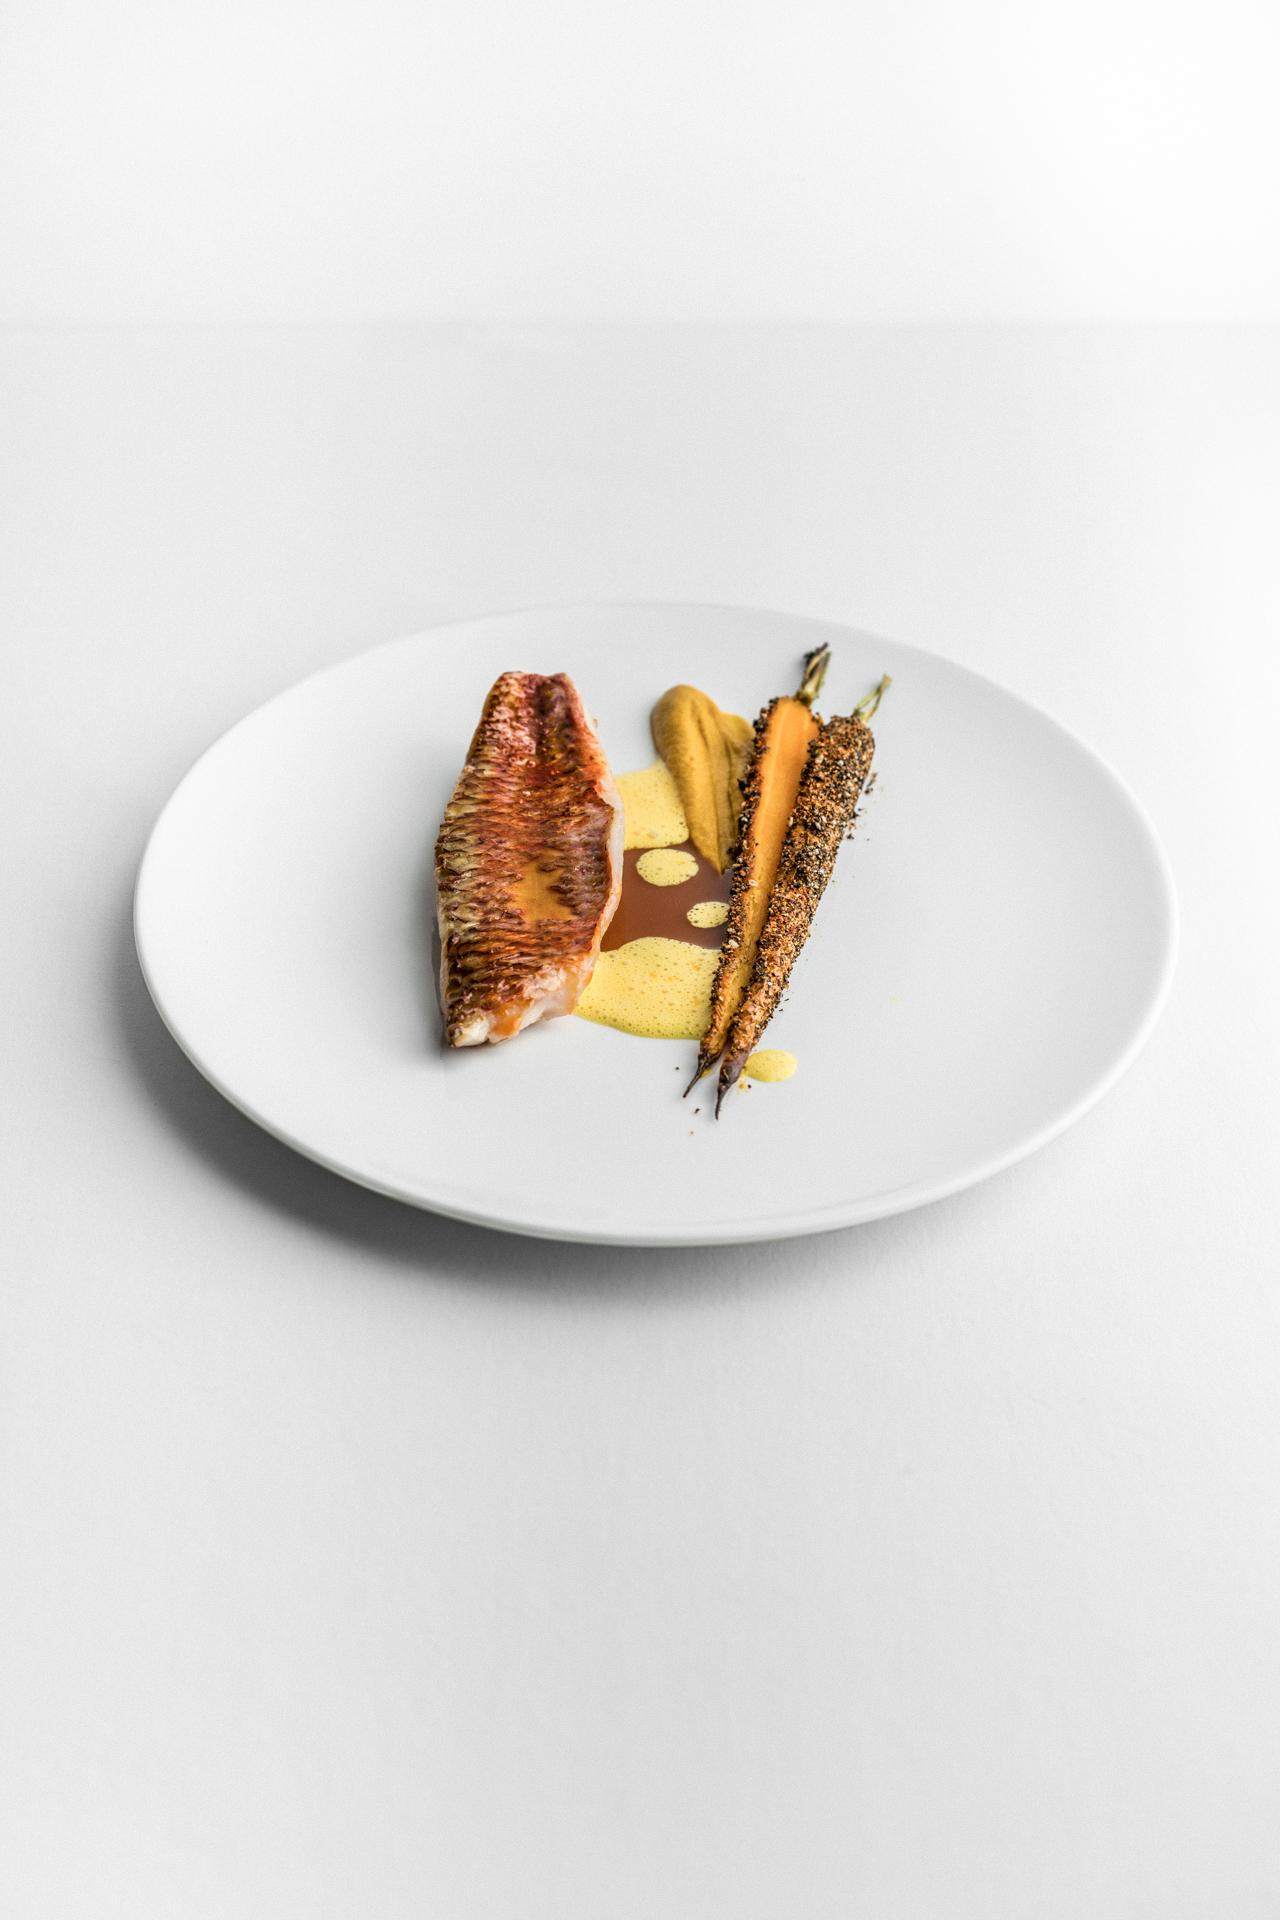 Triglia, carote e Medioriente di Luca Bizzarri, infoodfamily, foto di Matteo Bizzarri